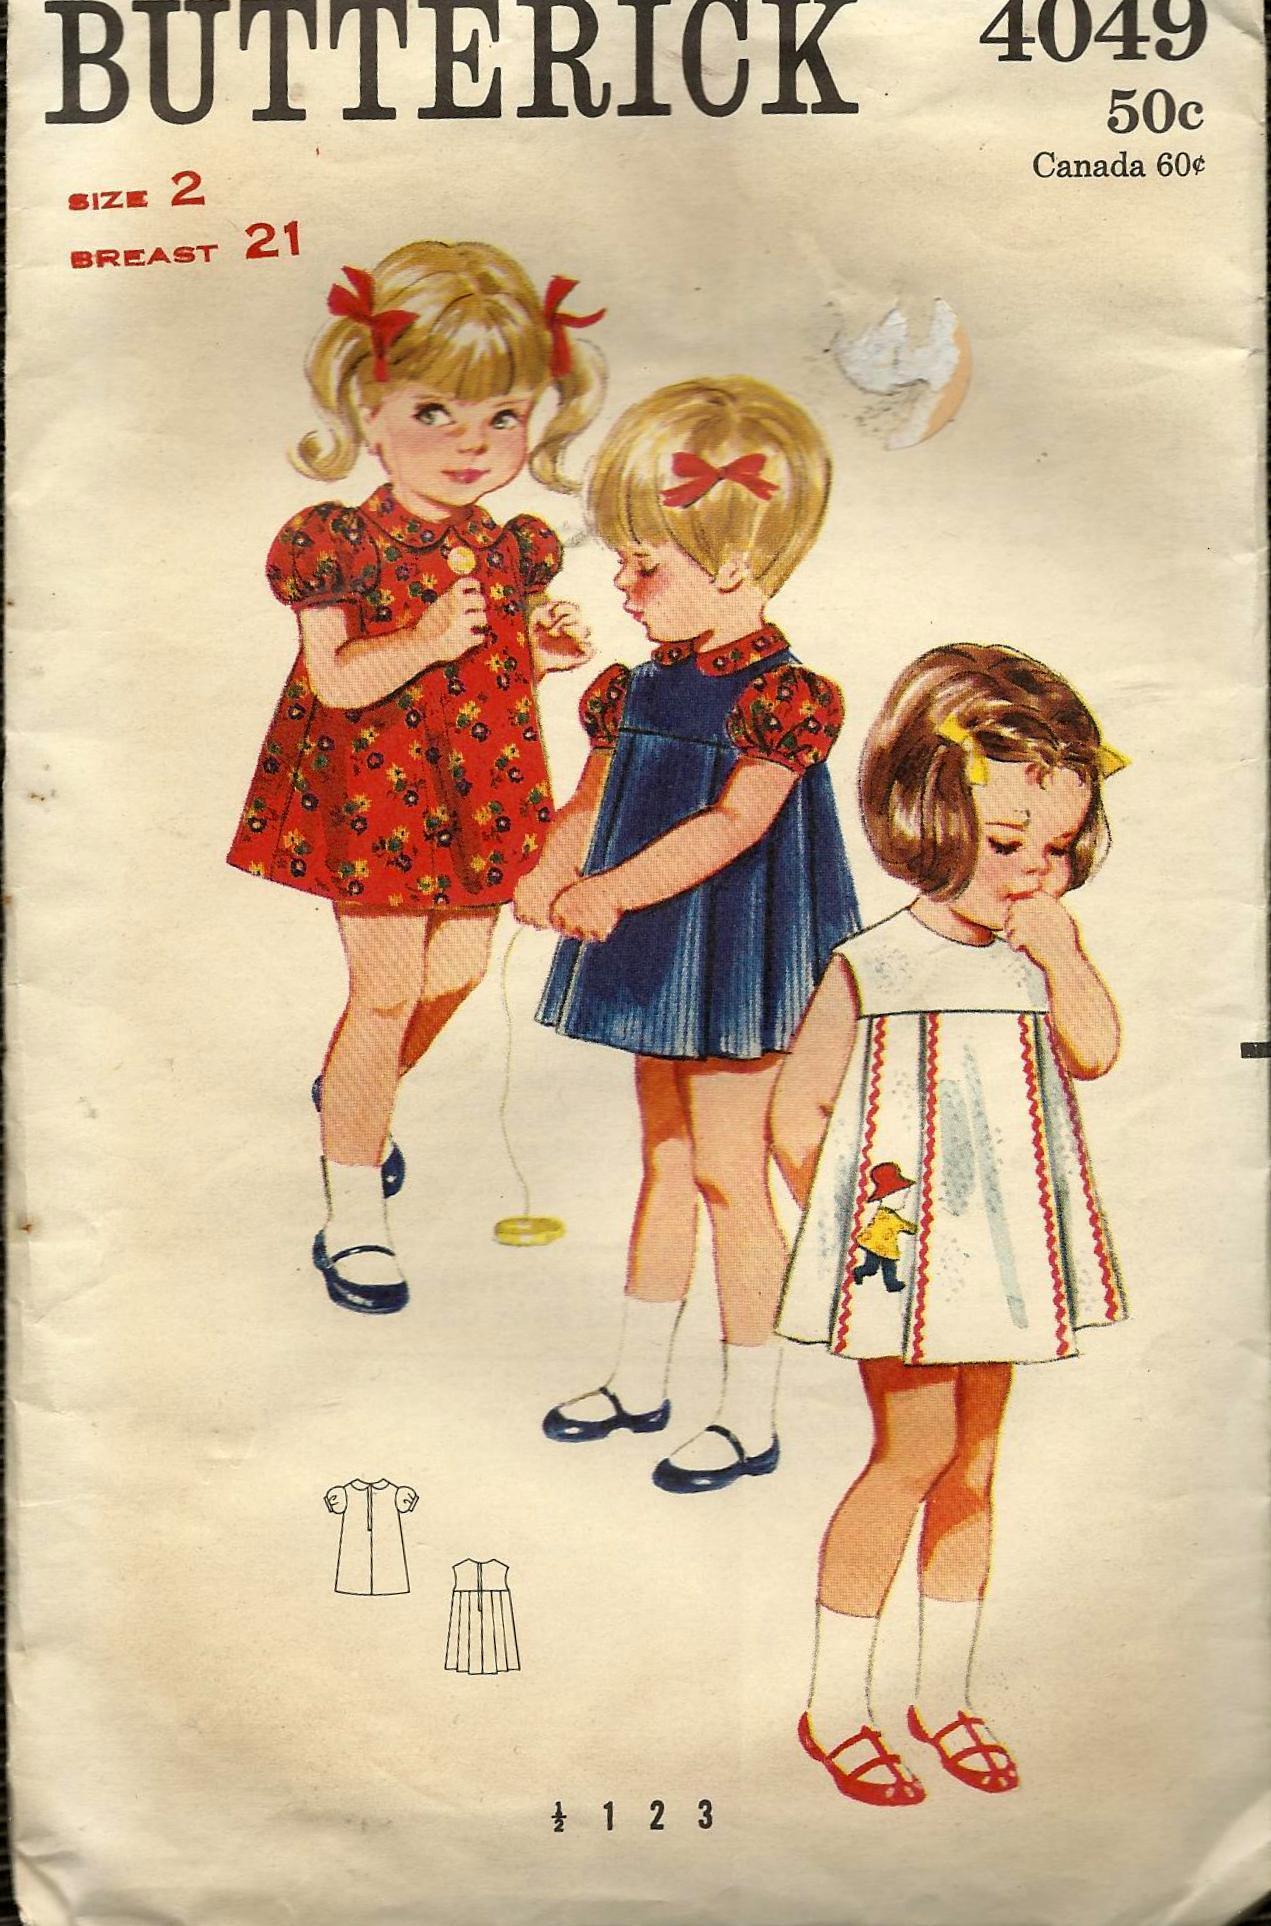 Butterick 4049 A Vintage Sewing Patterns Fandom